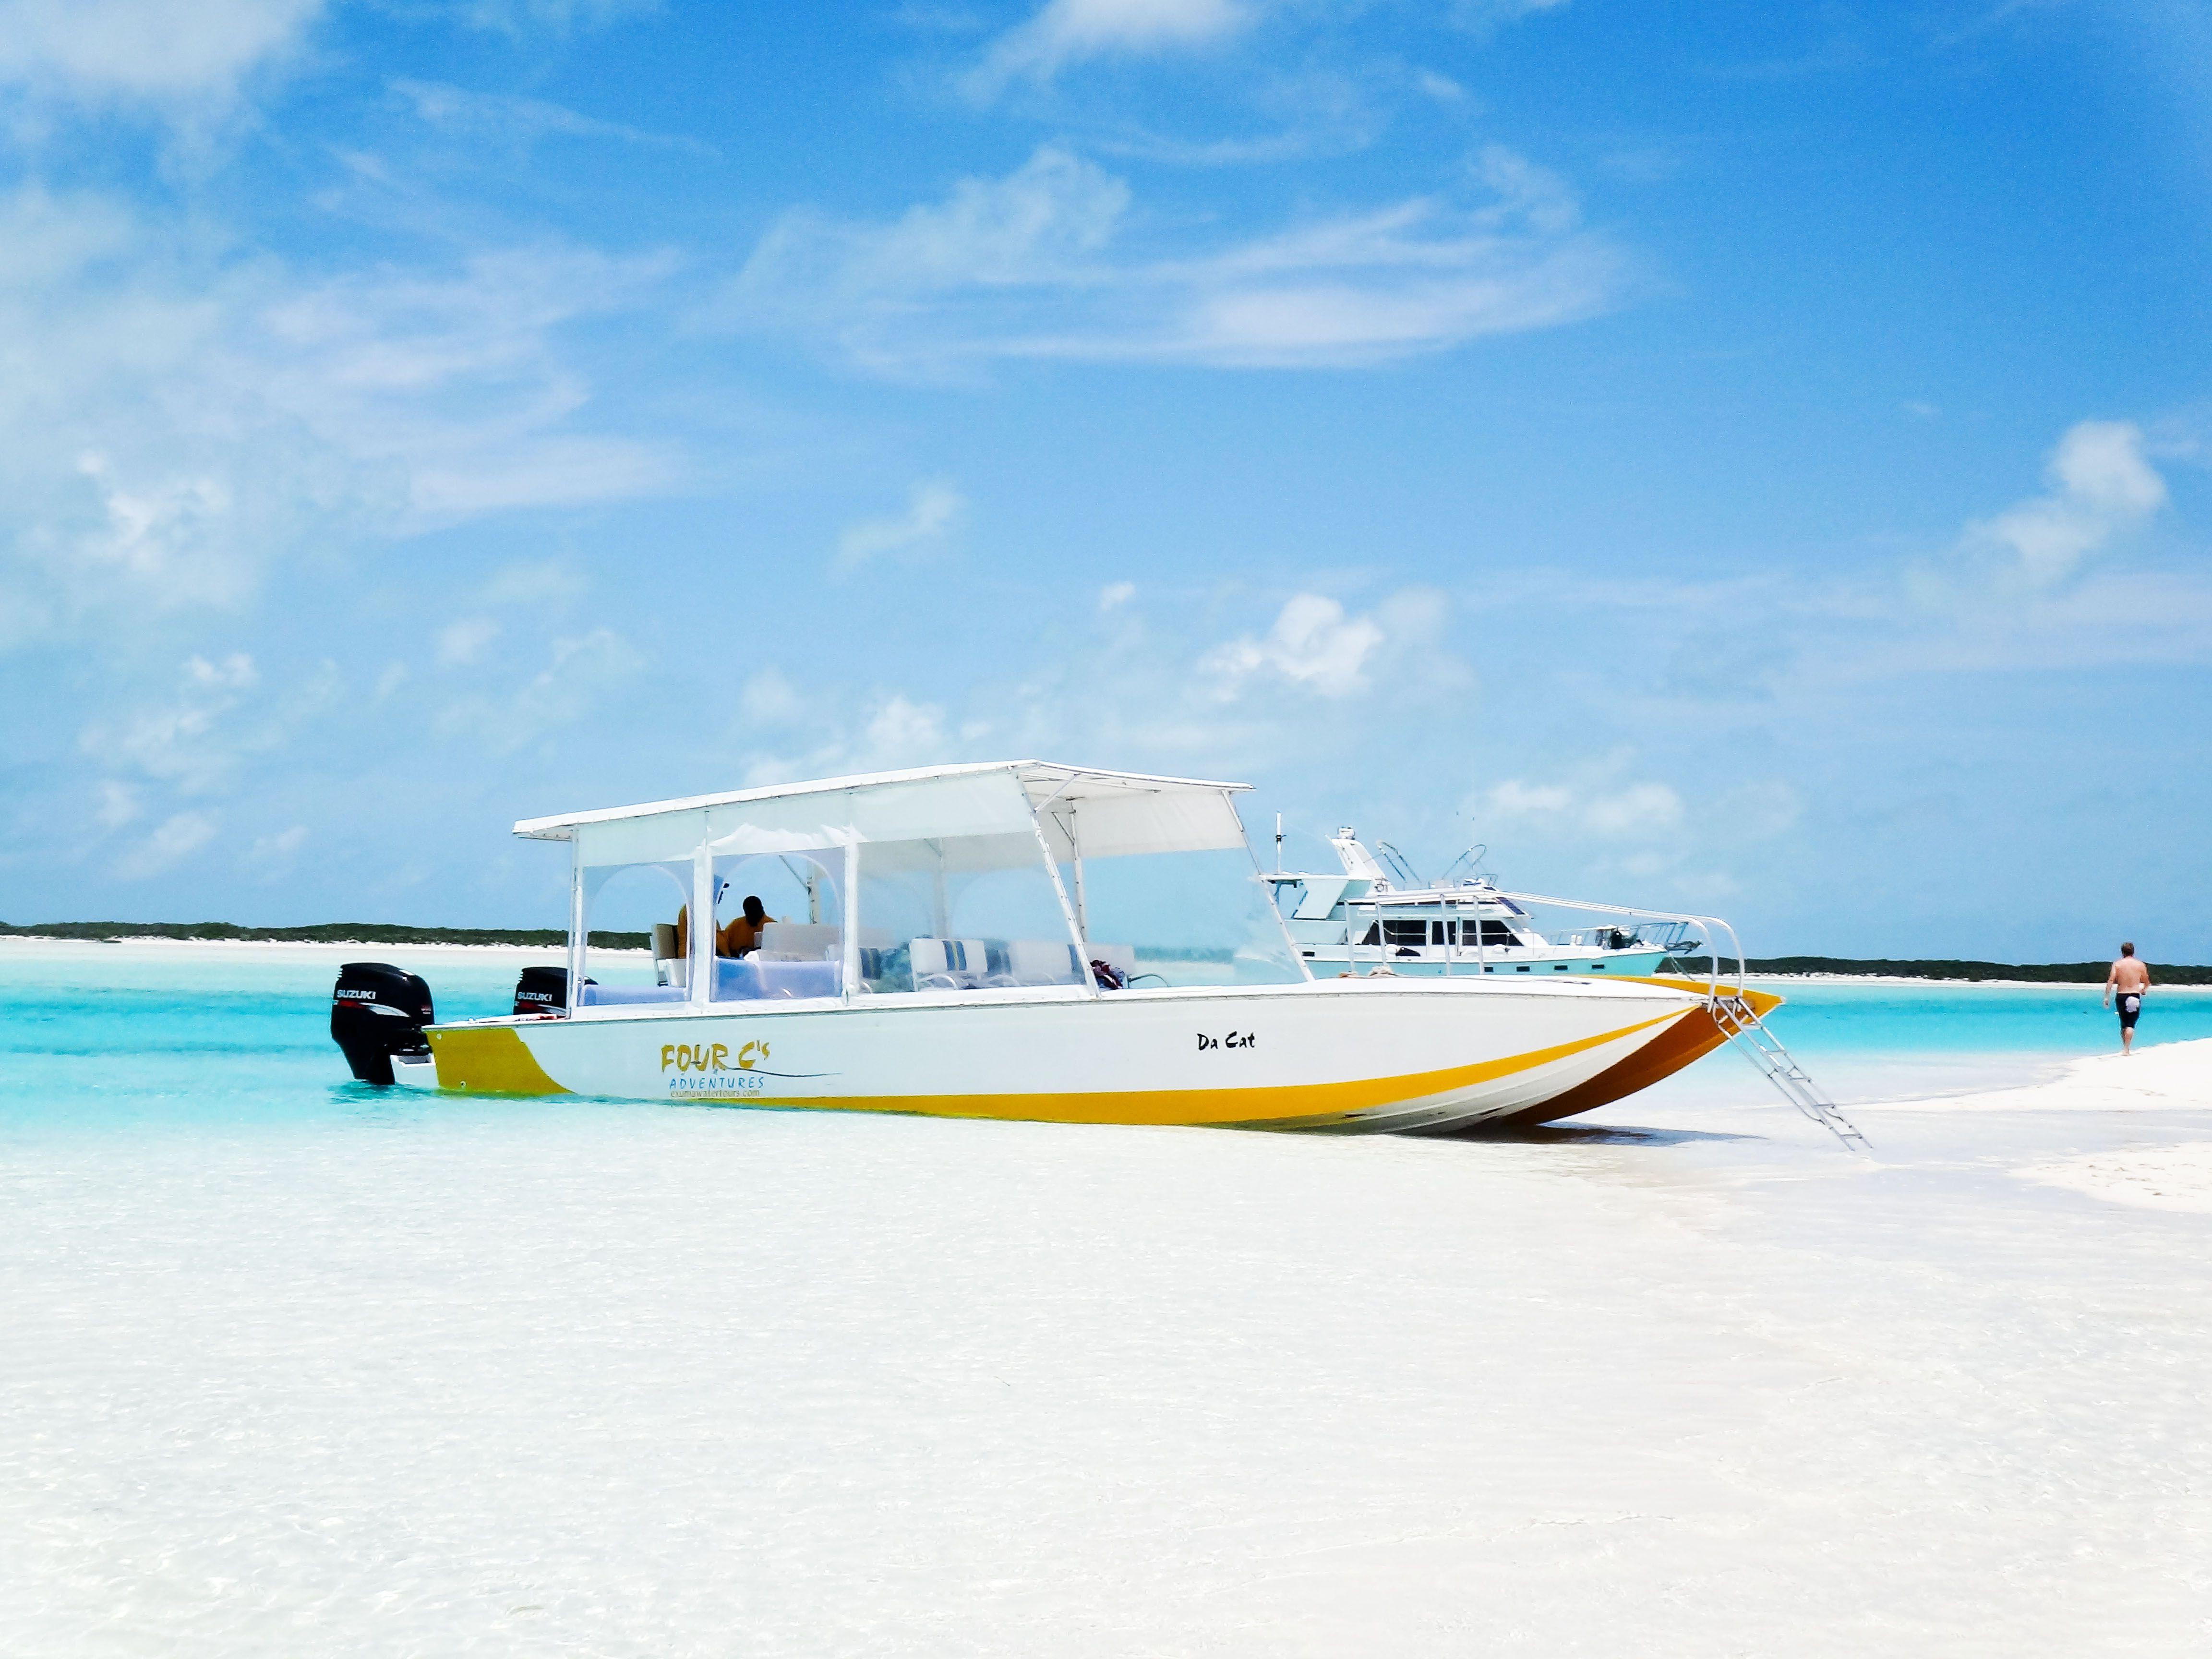 Four C S Tour In Exuma Bahamas So Much Fun Exuma Island Exuma Georgetown Bahamas